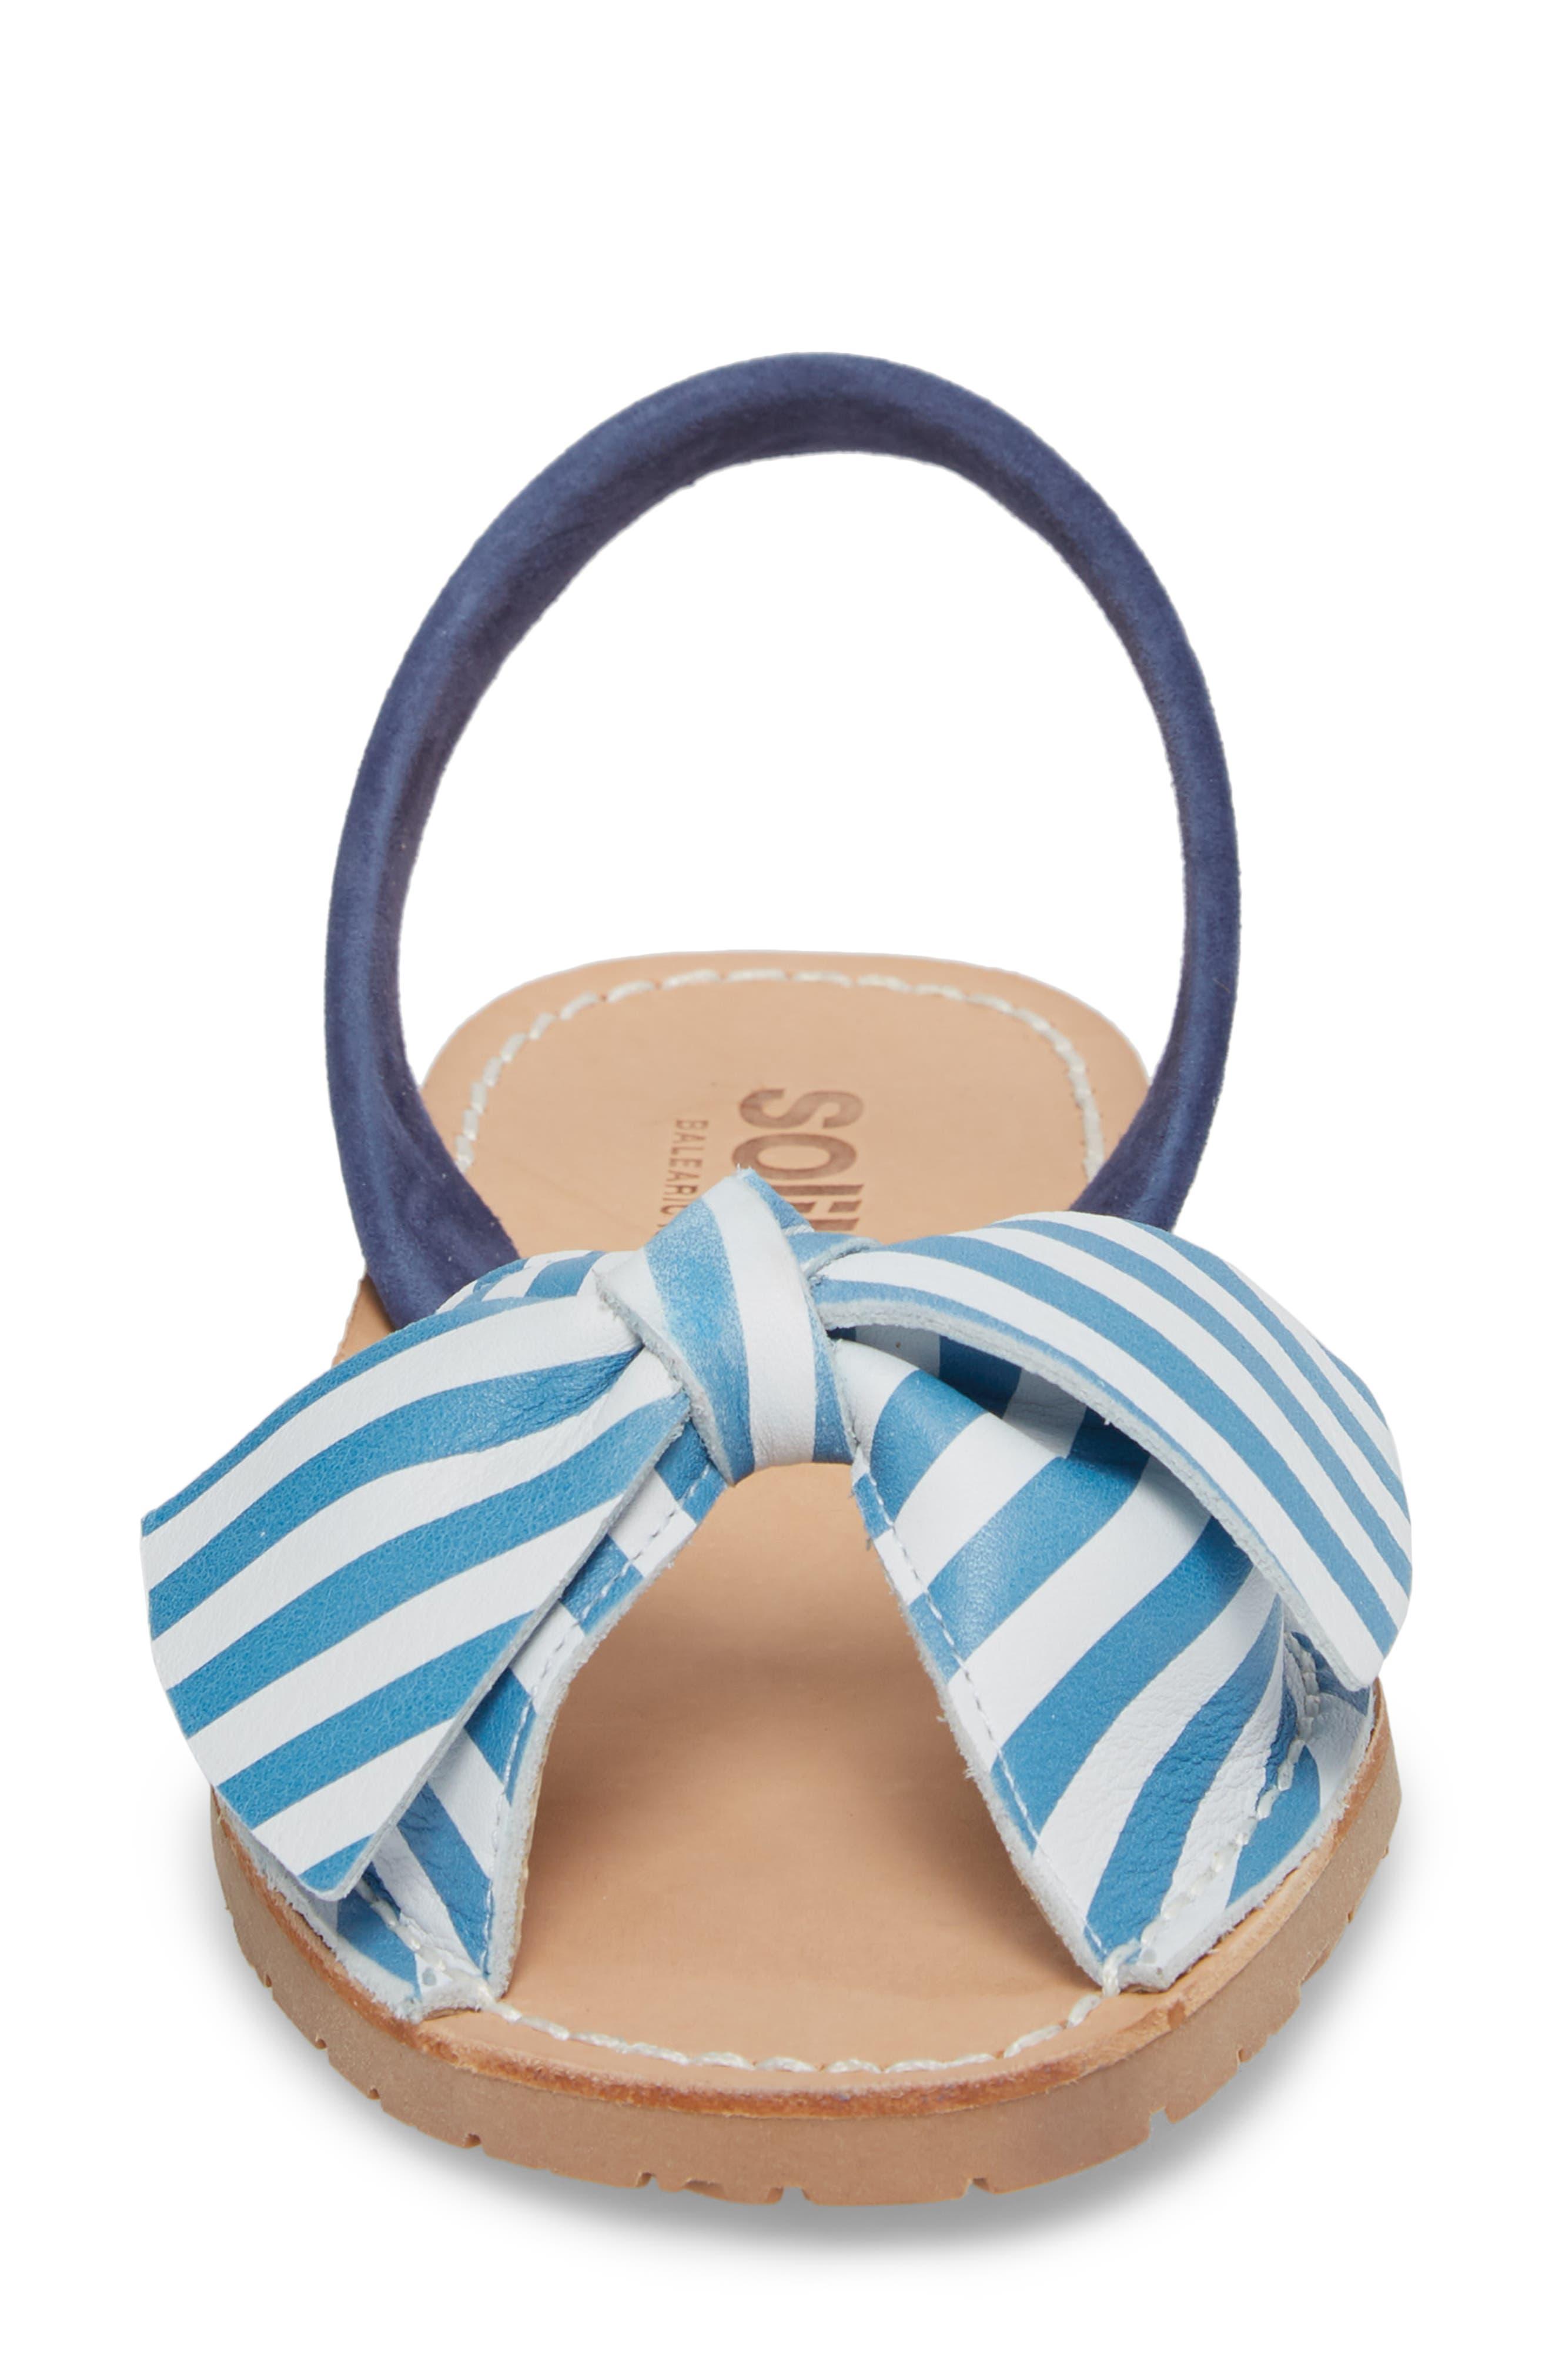 Bow Sandal,                             Alternate thumbnail 4, color,                             Blue And White